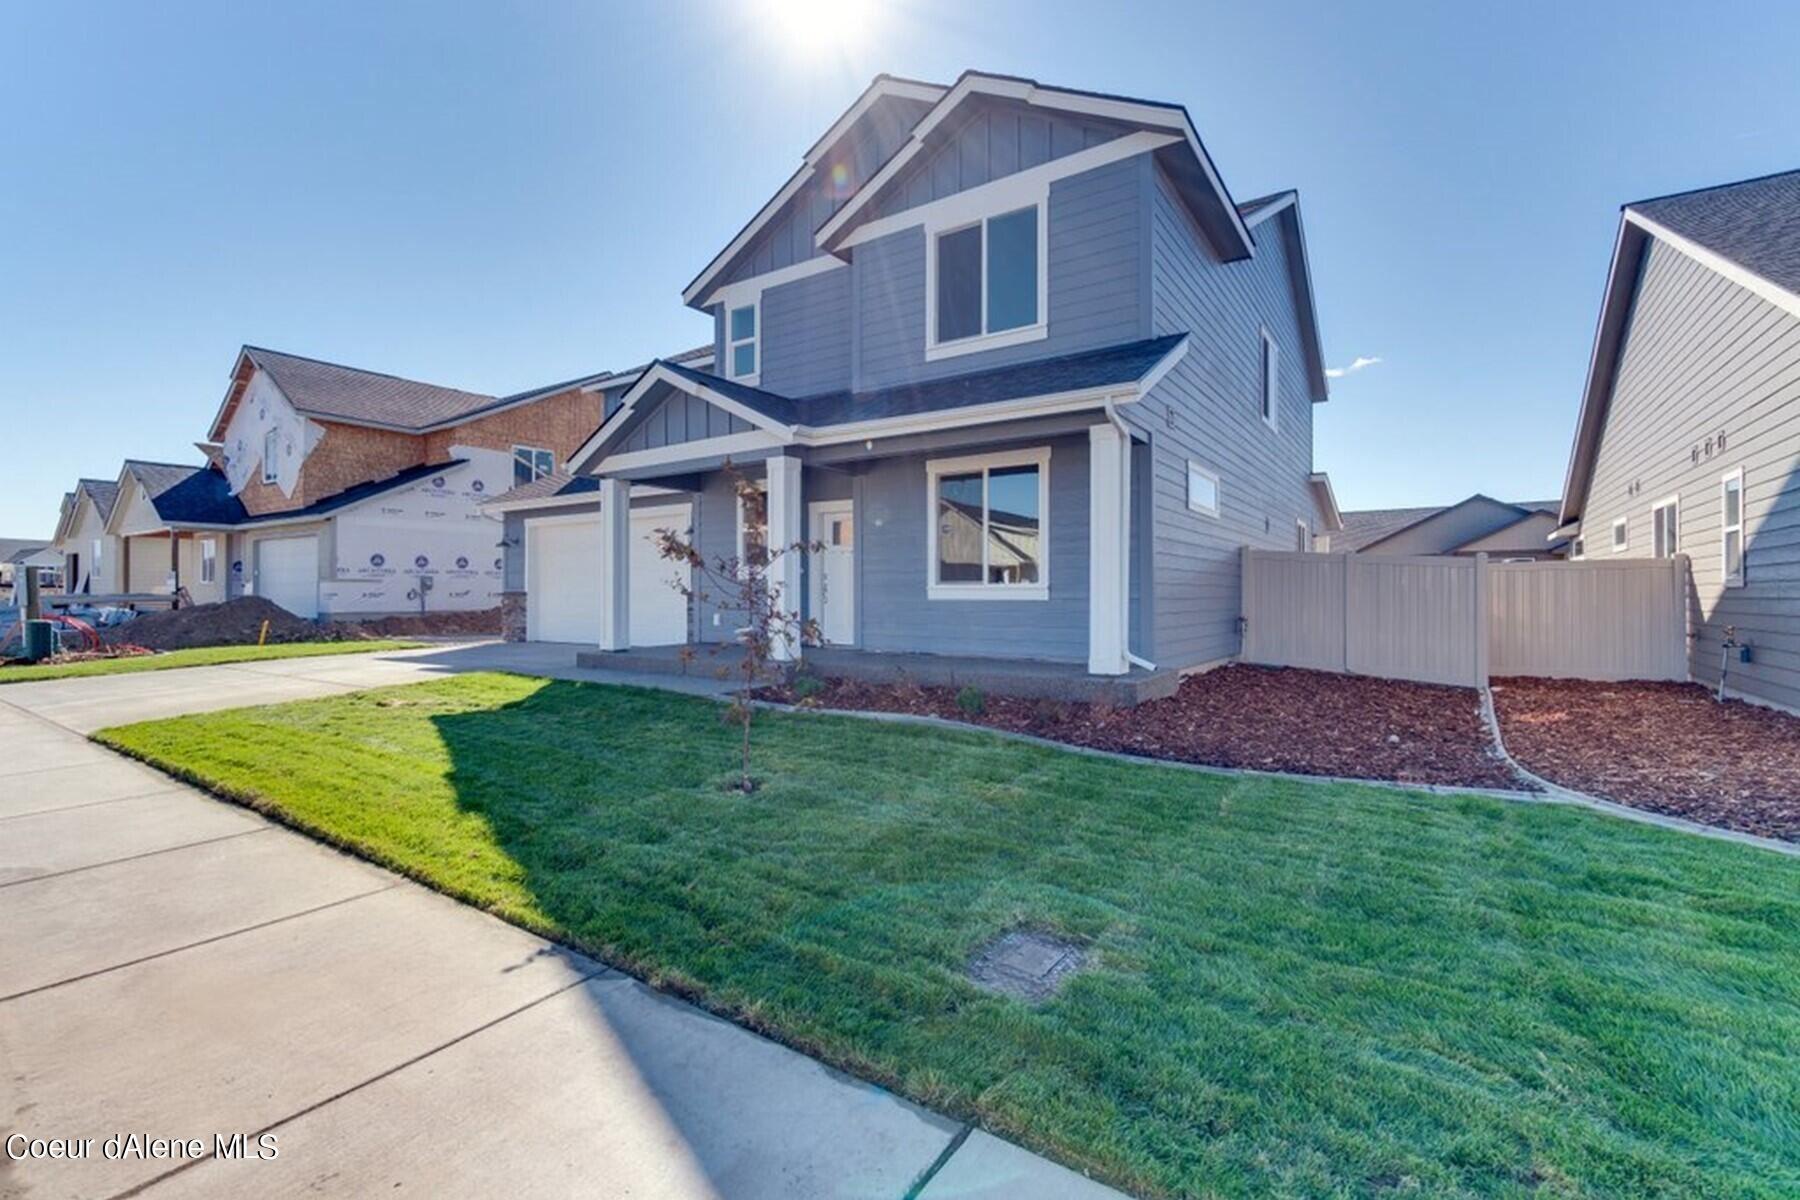 Photo of 4585 E Corsac Fox Ave, Post Falls, ID 83854 (MLS # 21-10593)